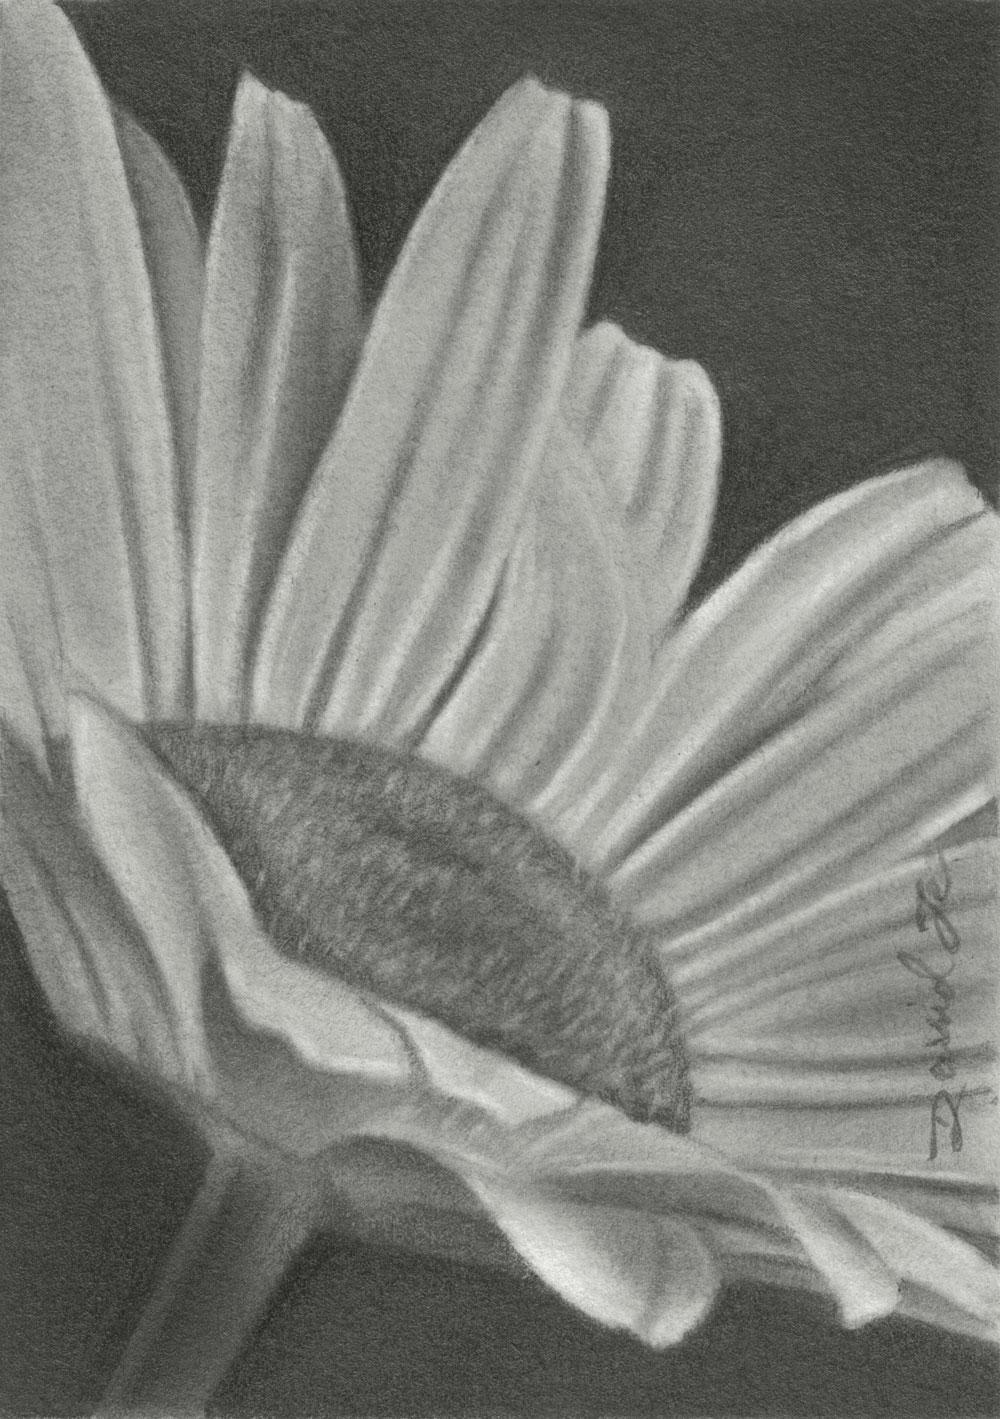 Pencil Drawings by David Te: September 2011